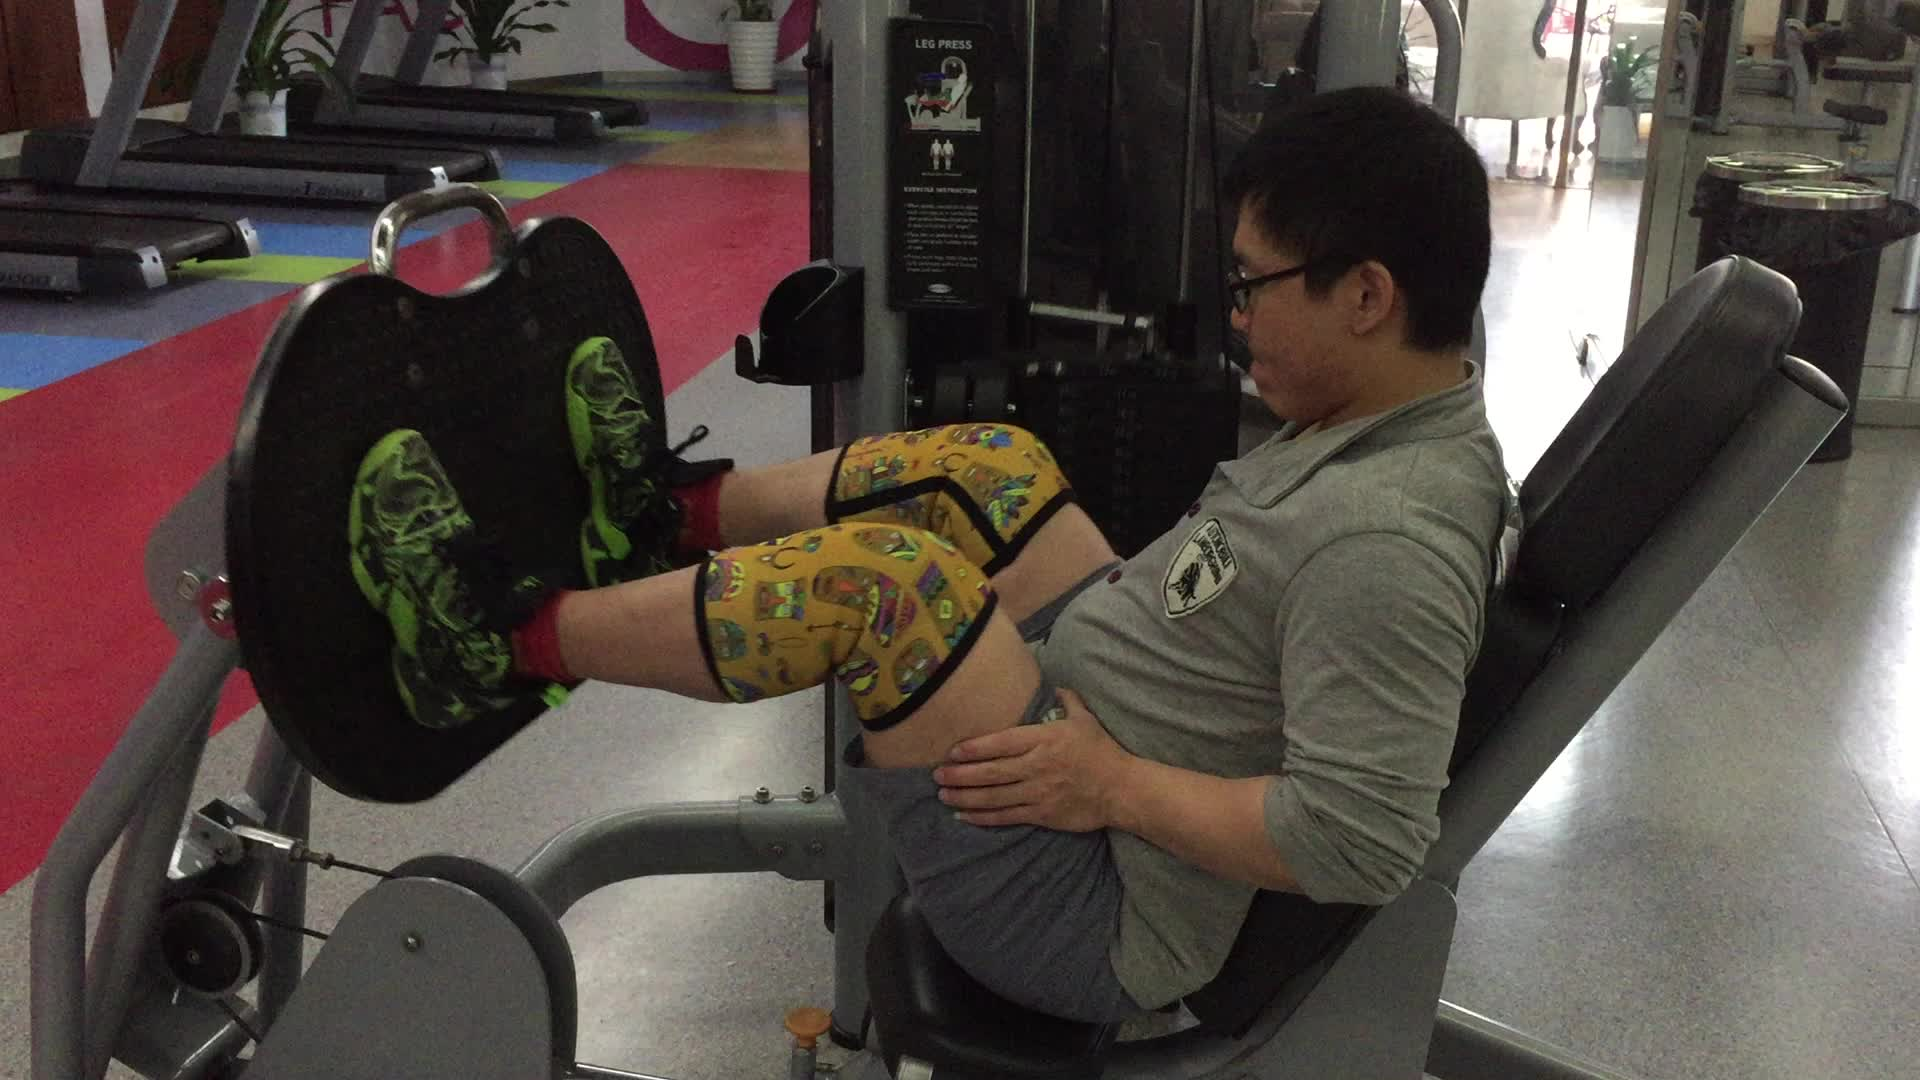 Fashion design breathable 5mm Neoprene custom Knee protector support brace for fitness